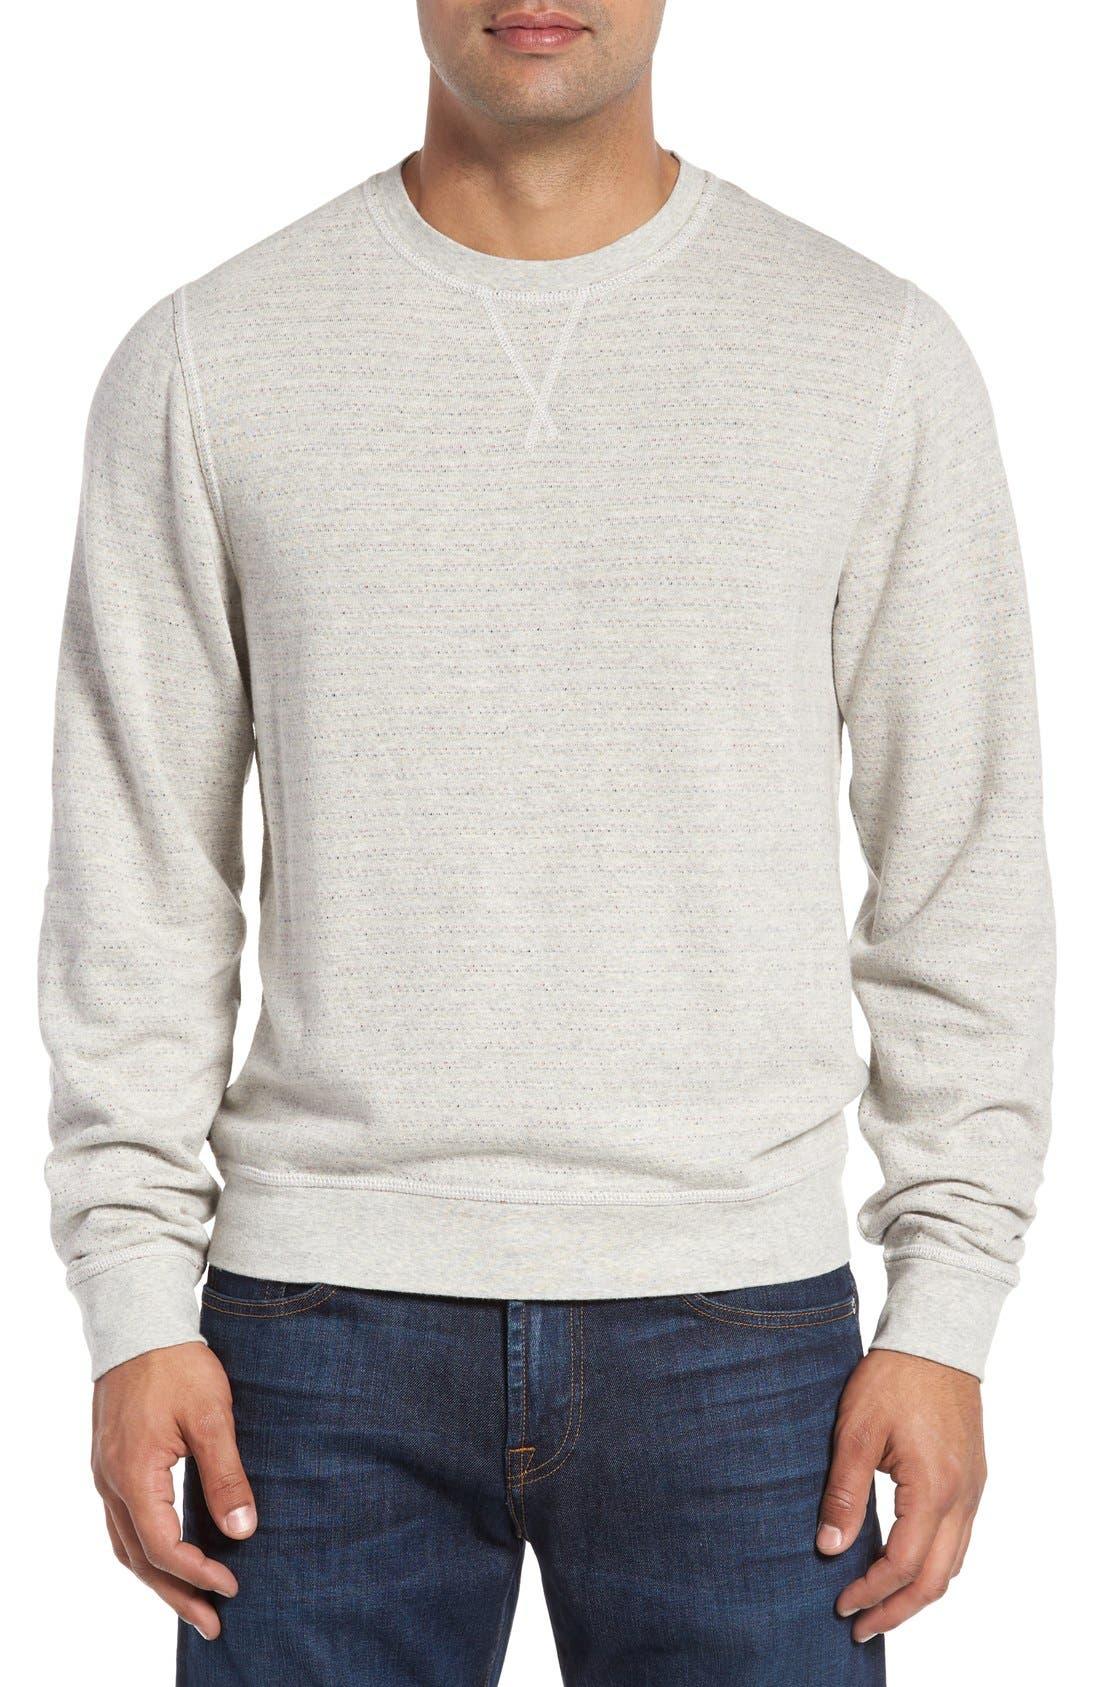 'Gleann' French Terry Crewneck Sweatshirt,                             Main thumbnail 1, color,                             250